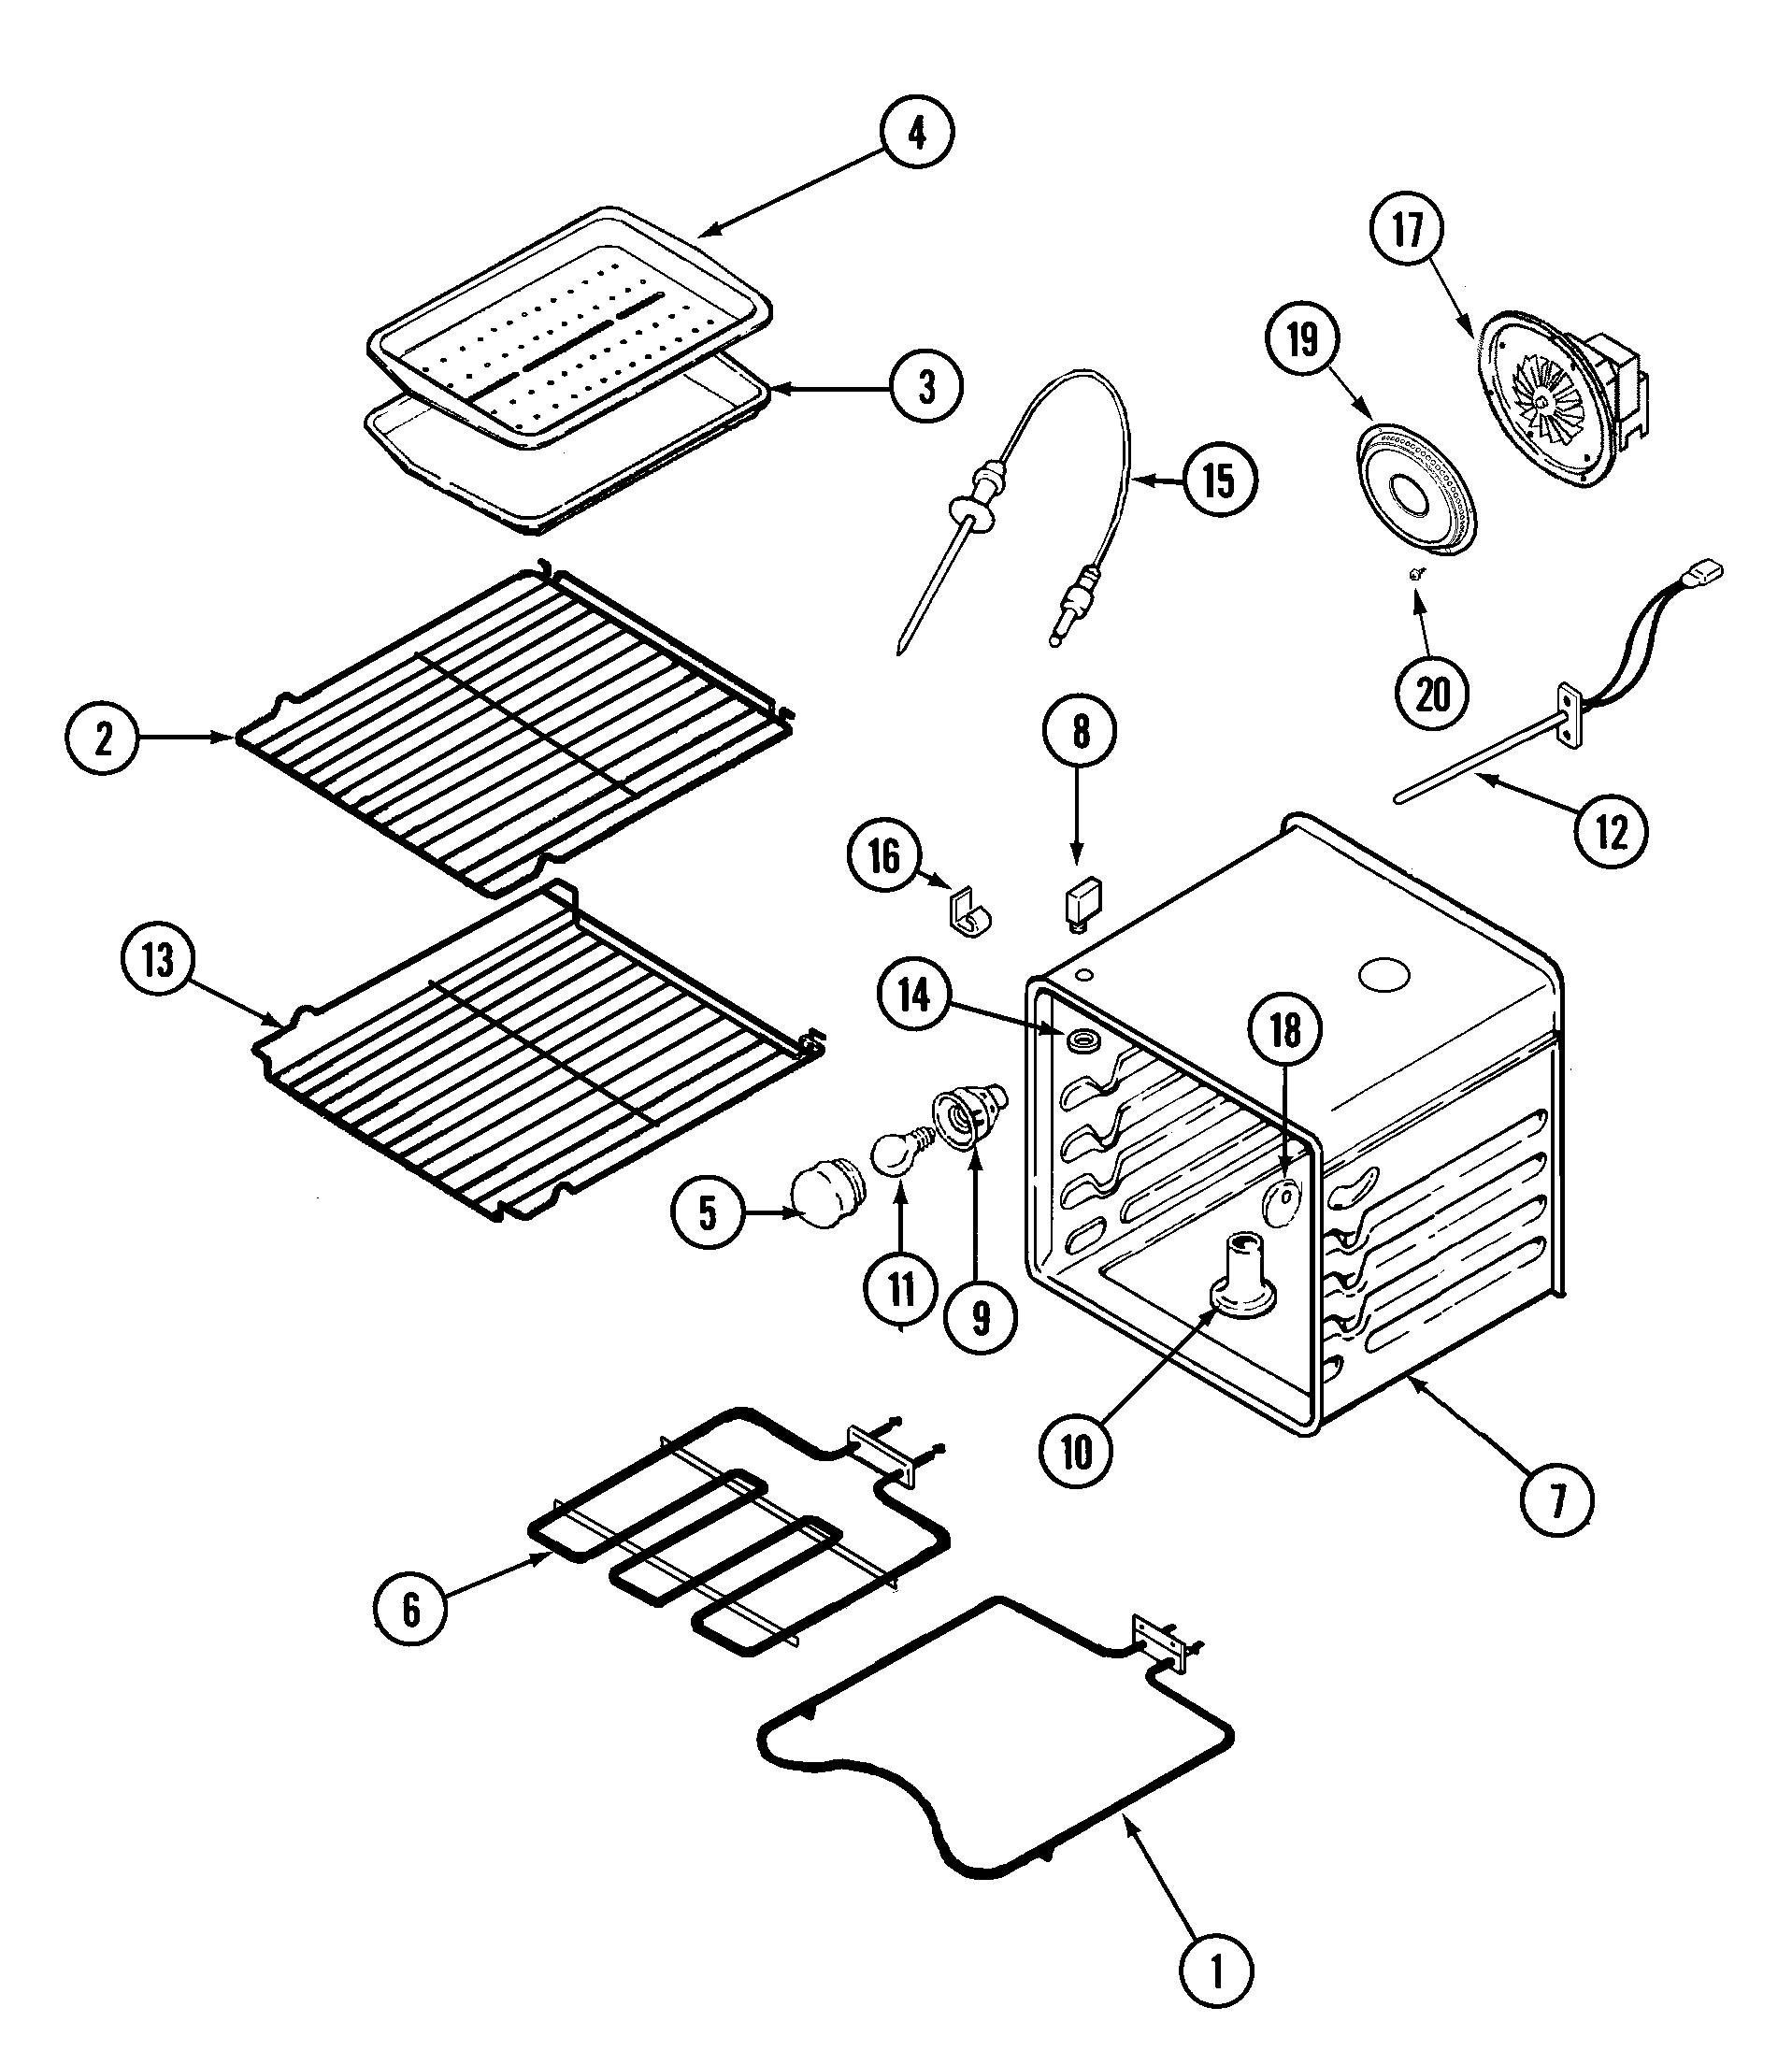 oven diagram  u0026 parts list for model jmw9527cas jenn